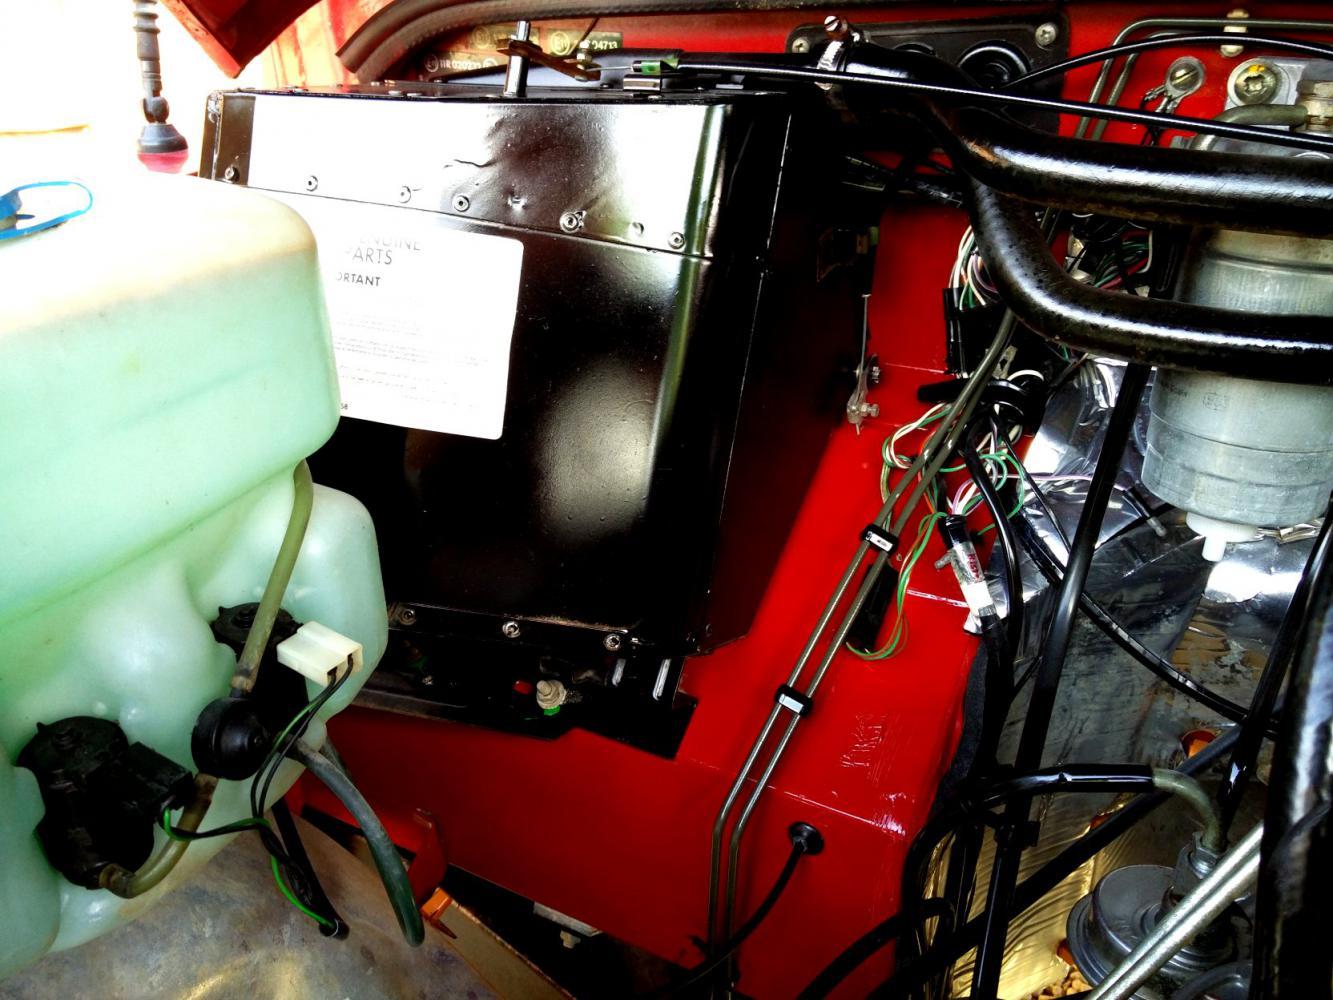 Click image for larger version  Name:1992 LR LHD Defender 90 Red 200 Tdi engine bay heater.jpg Views:154 Size:168.1 KB ID:263762